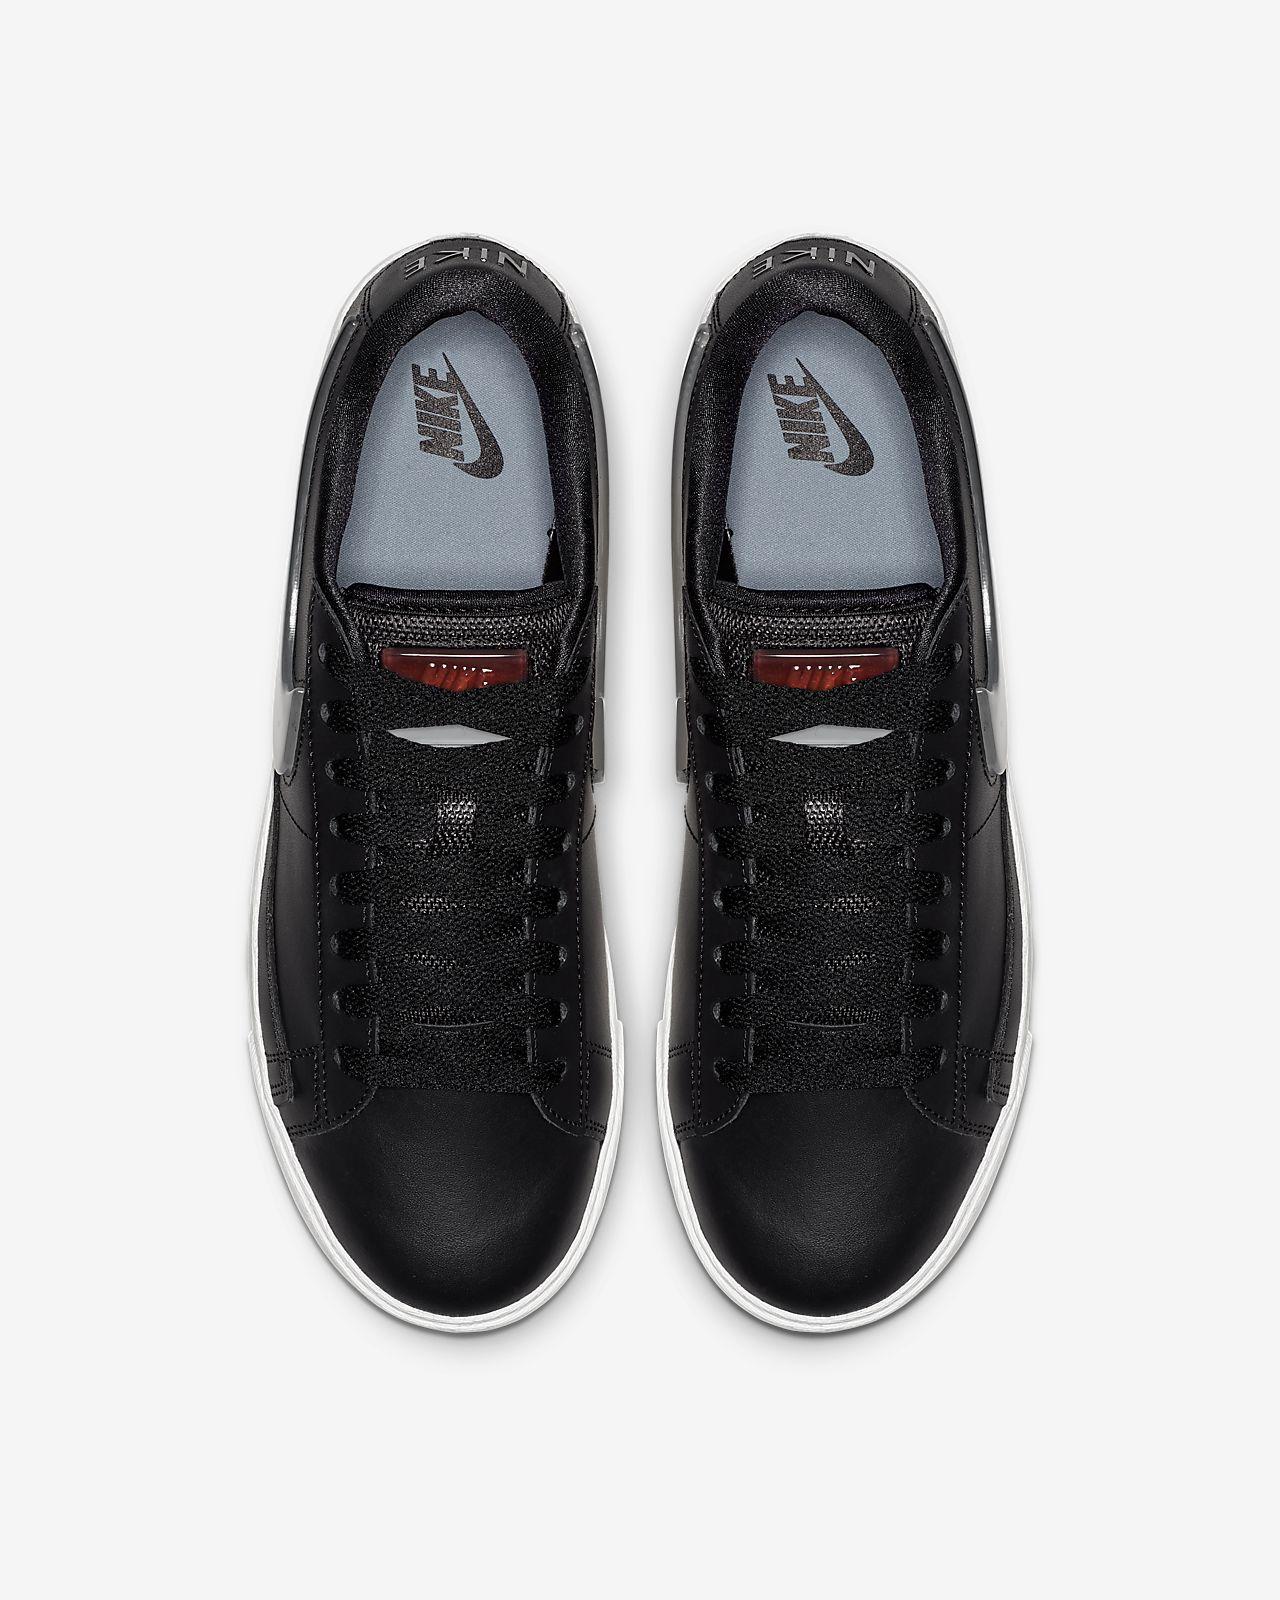 7f7f7f993e5 Nike Blazer Low Lux Premium Women s Shoe. Nike.com CA